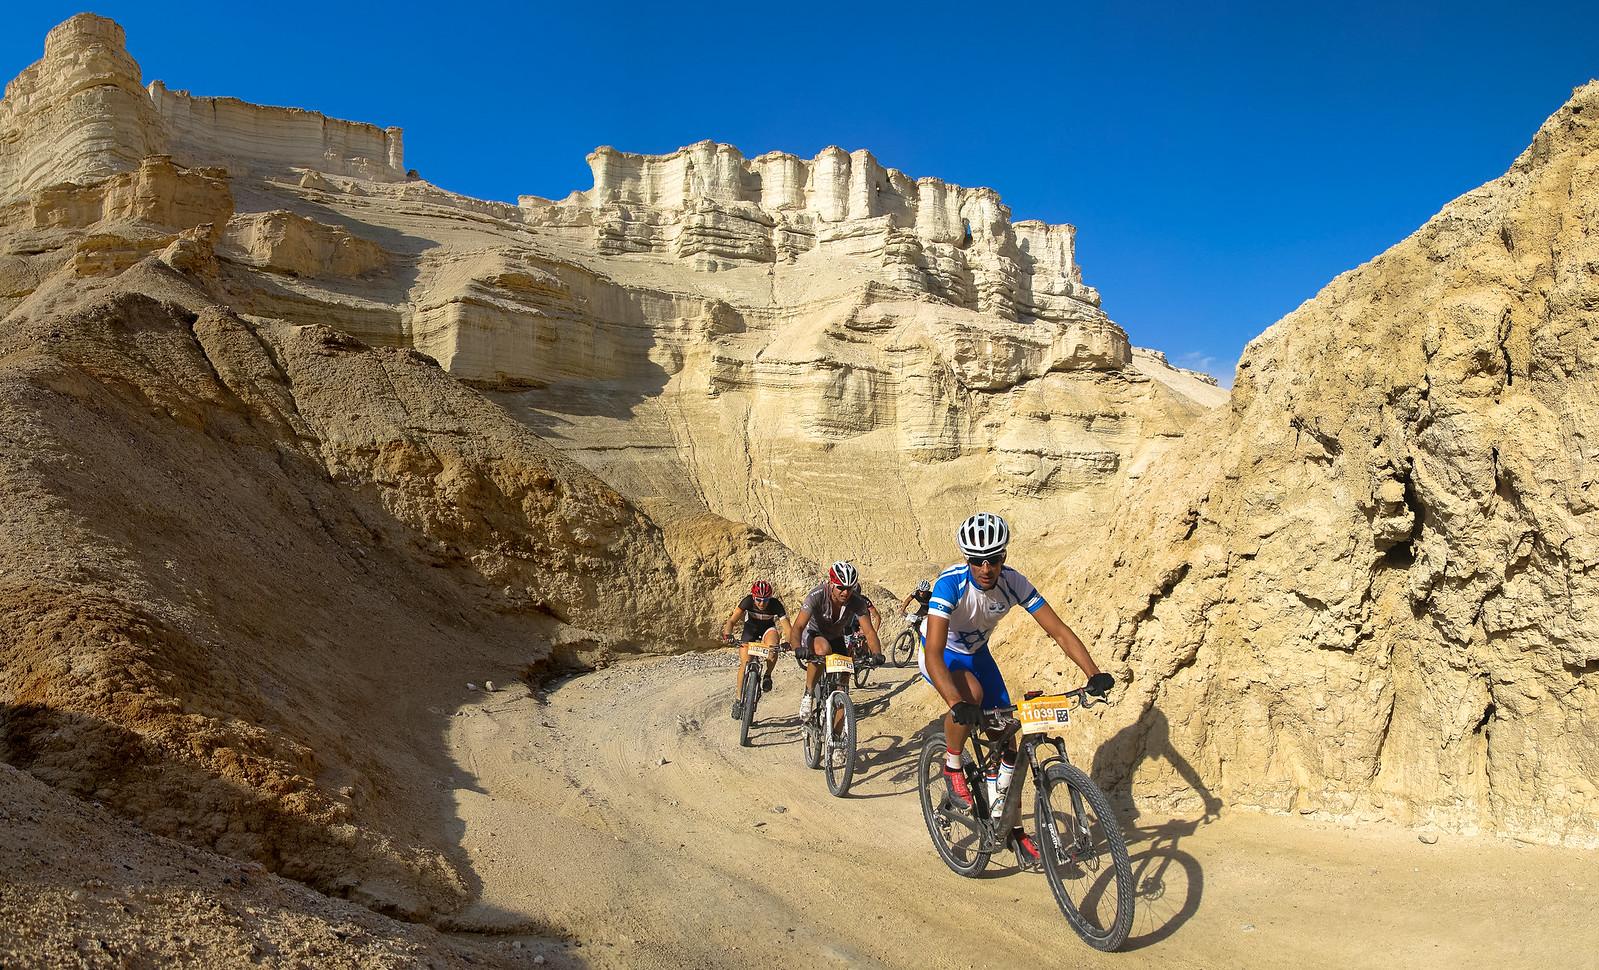 Sodom Kanyon - Desert Challenge riders_YOAV LAVI OUTDOOR PHOTOS_IMOT